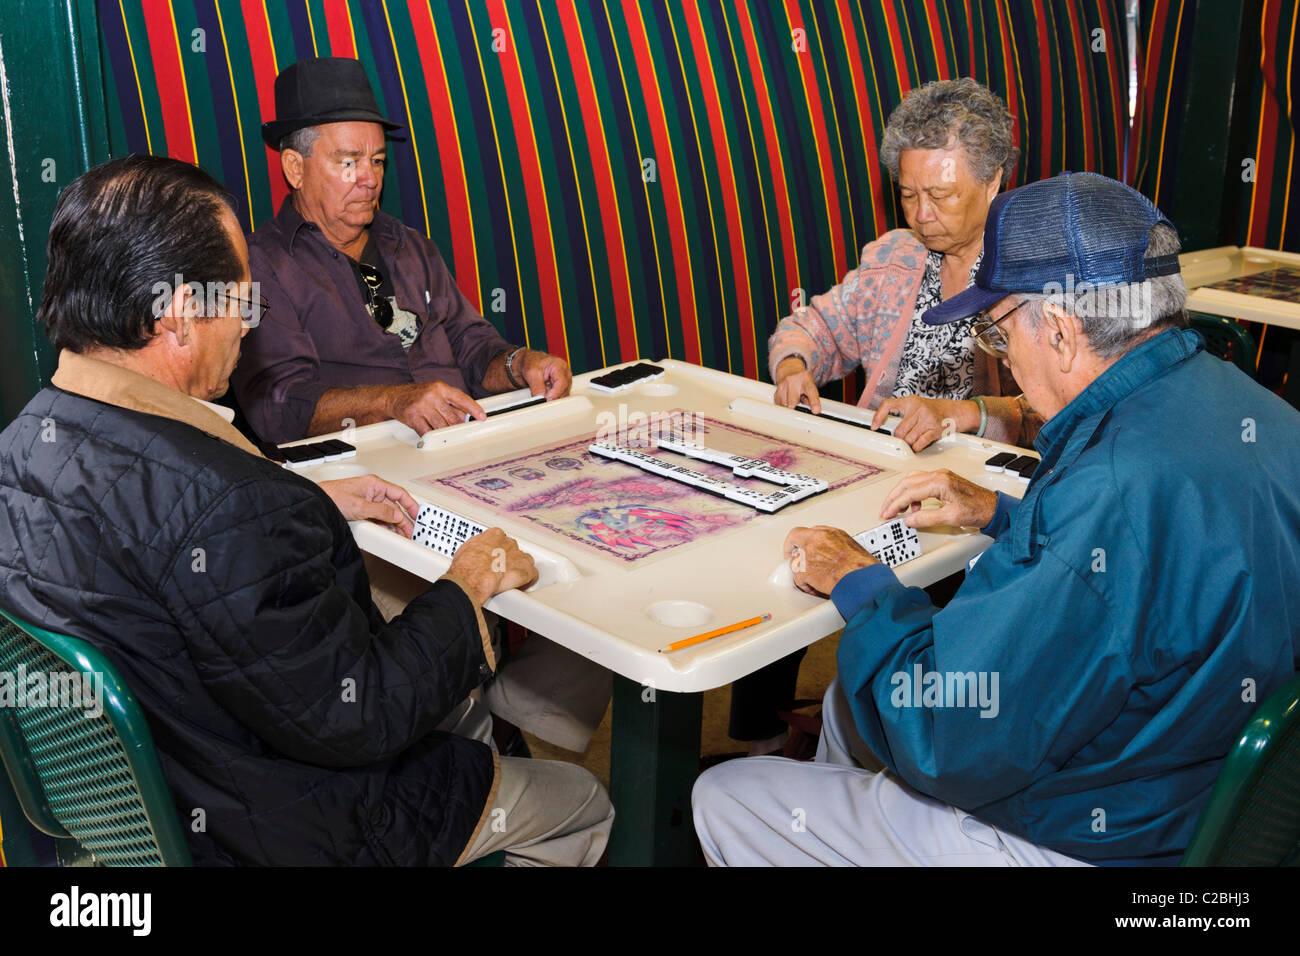 Domino Players, Little Havana, Miami - Stock Image